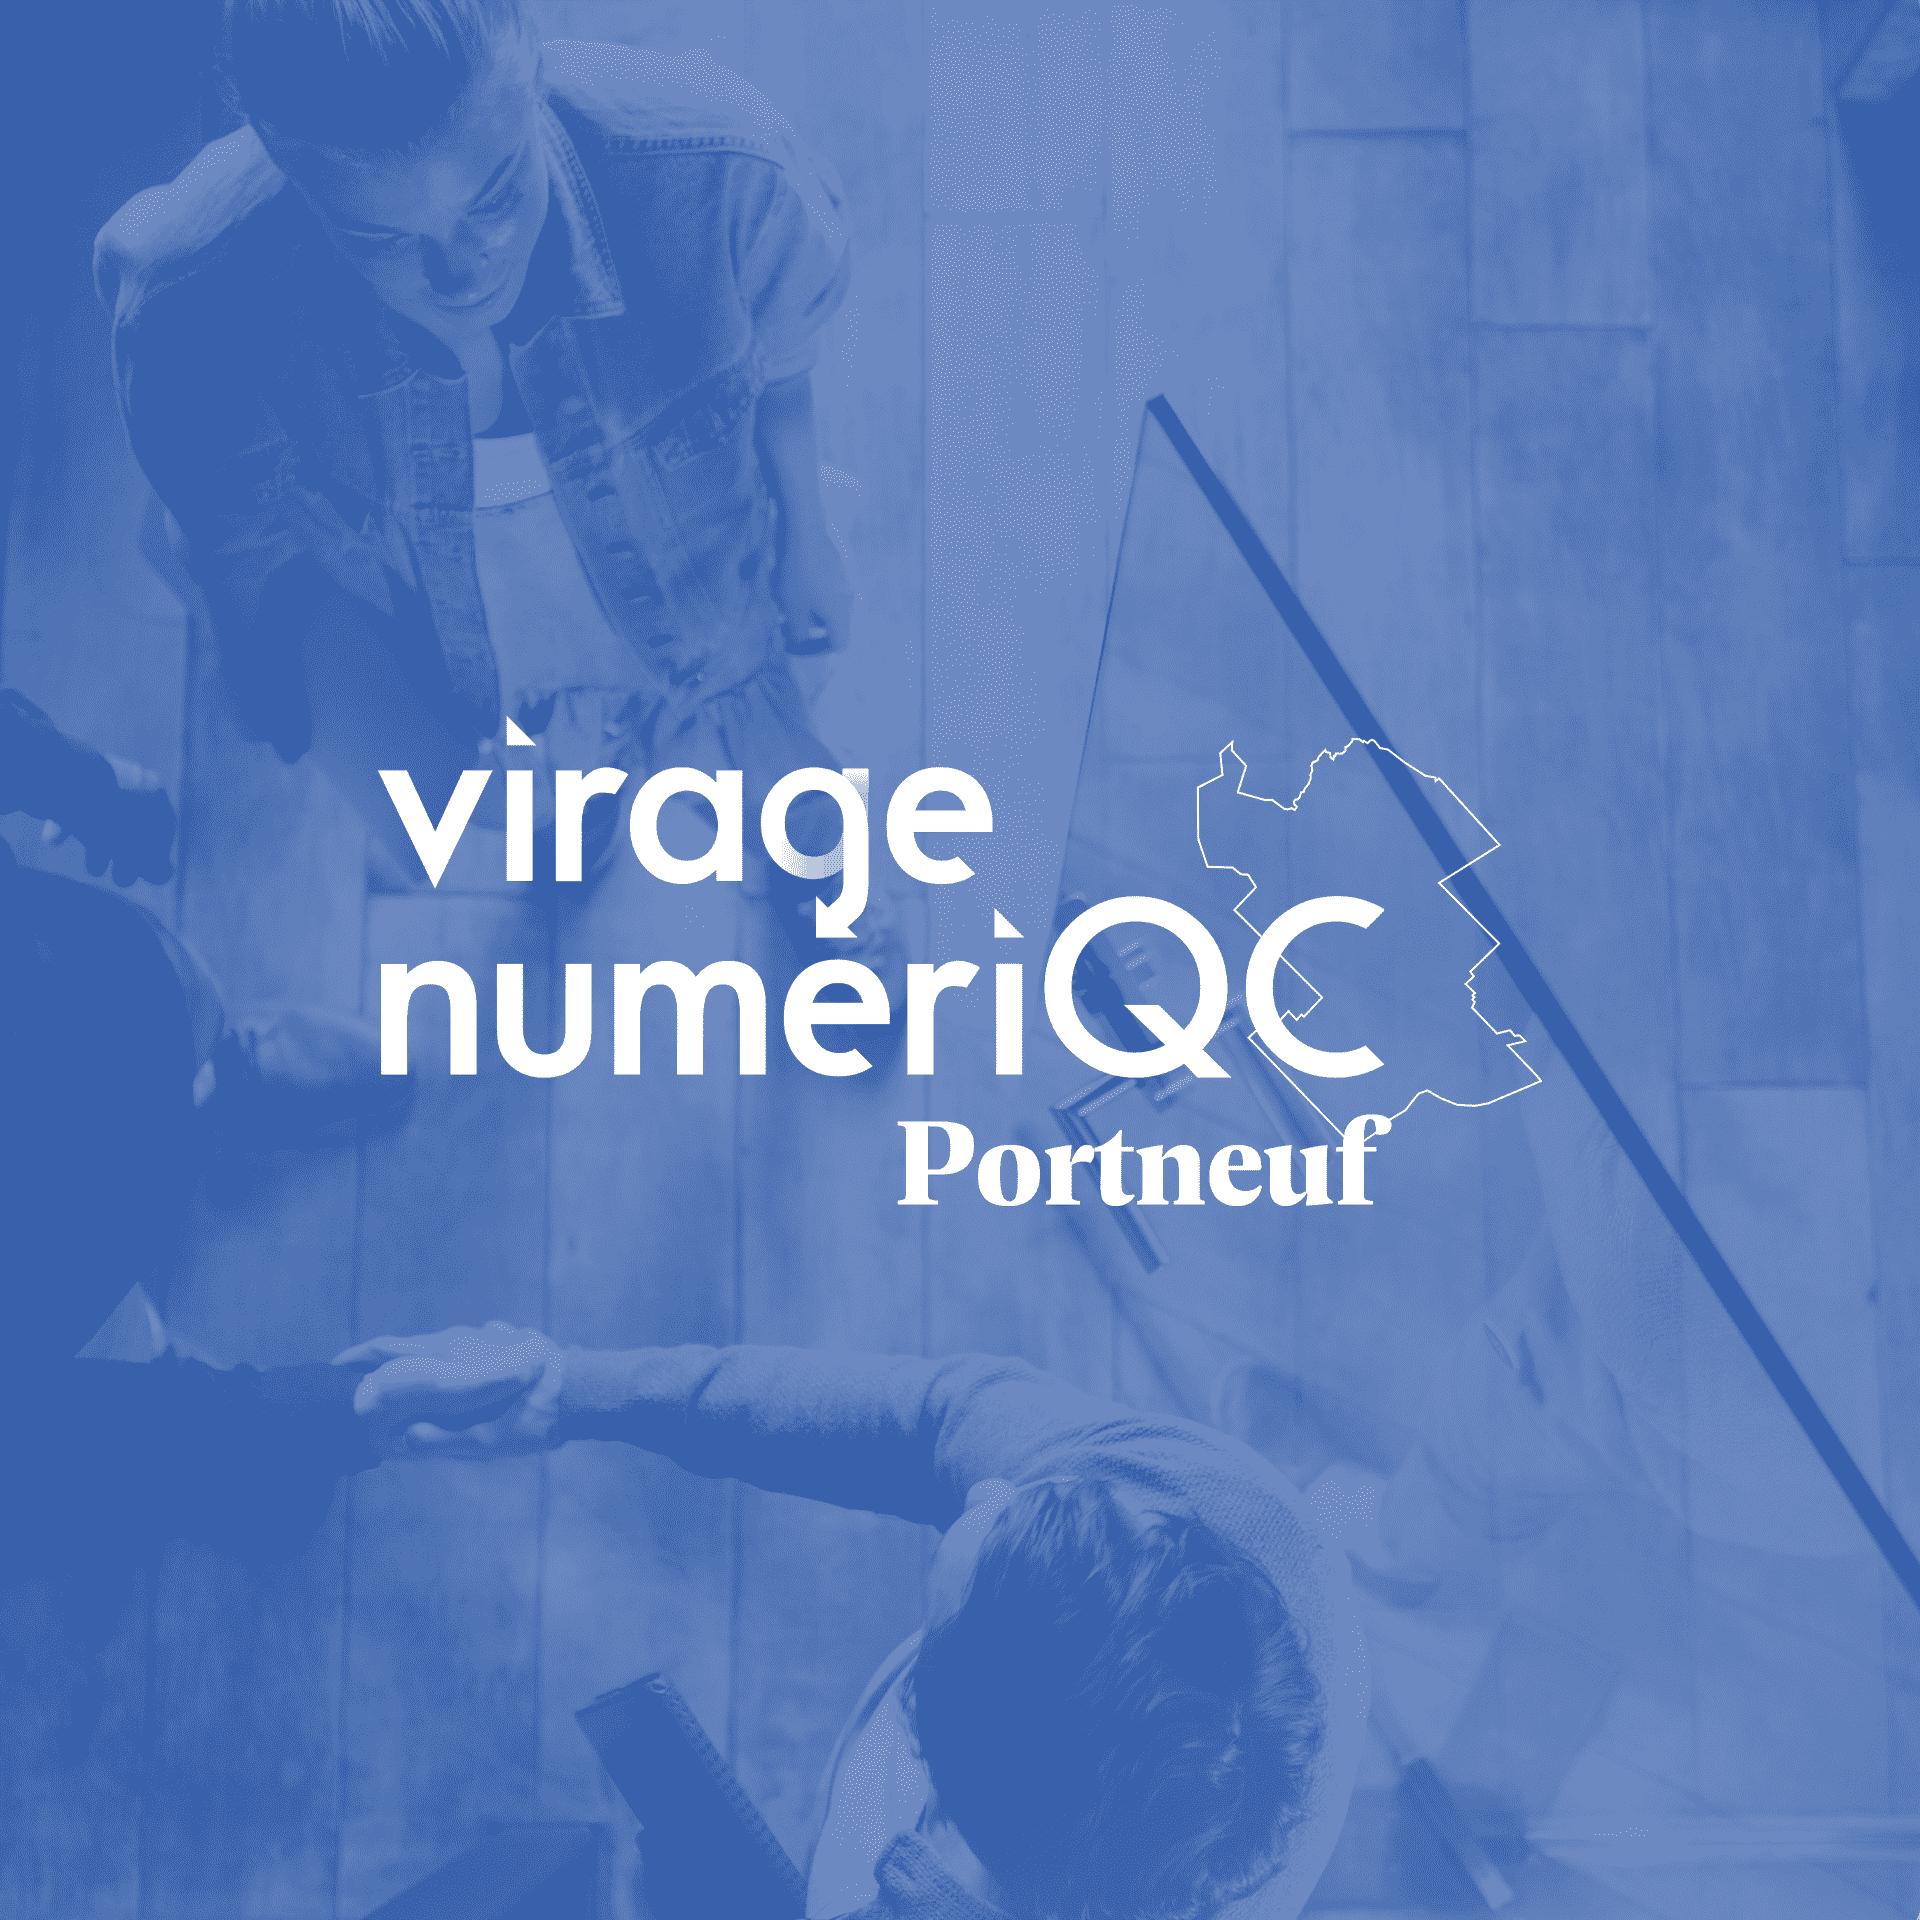 virage numeriqc portneuf